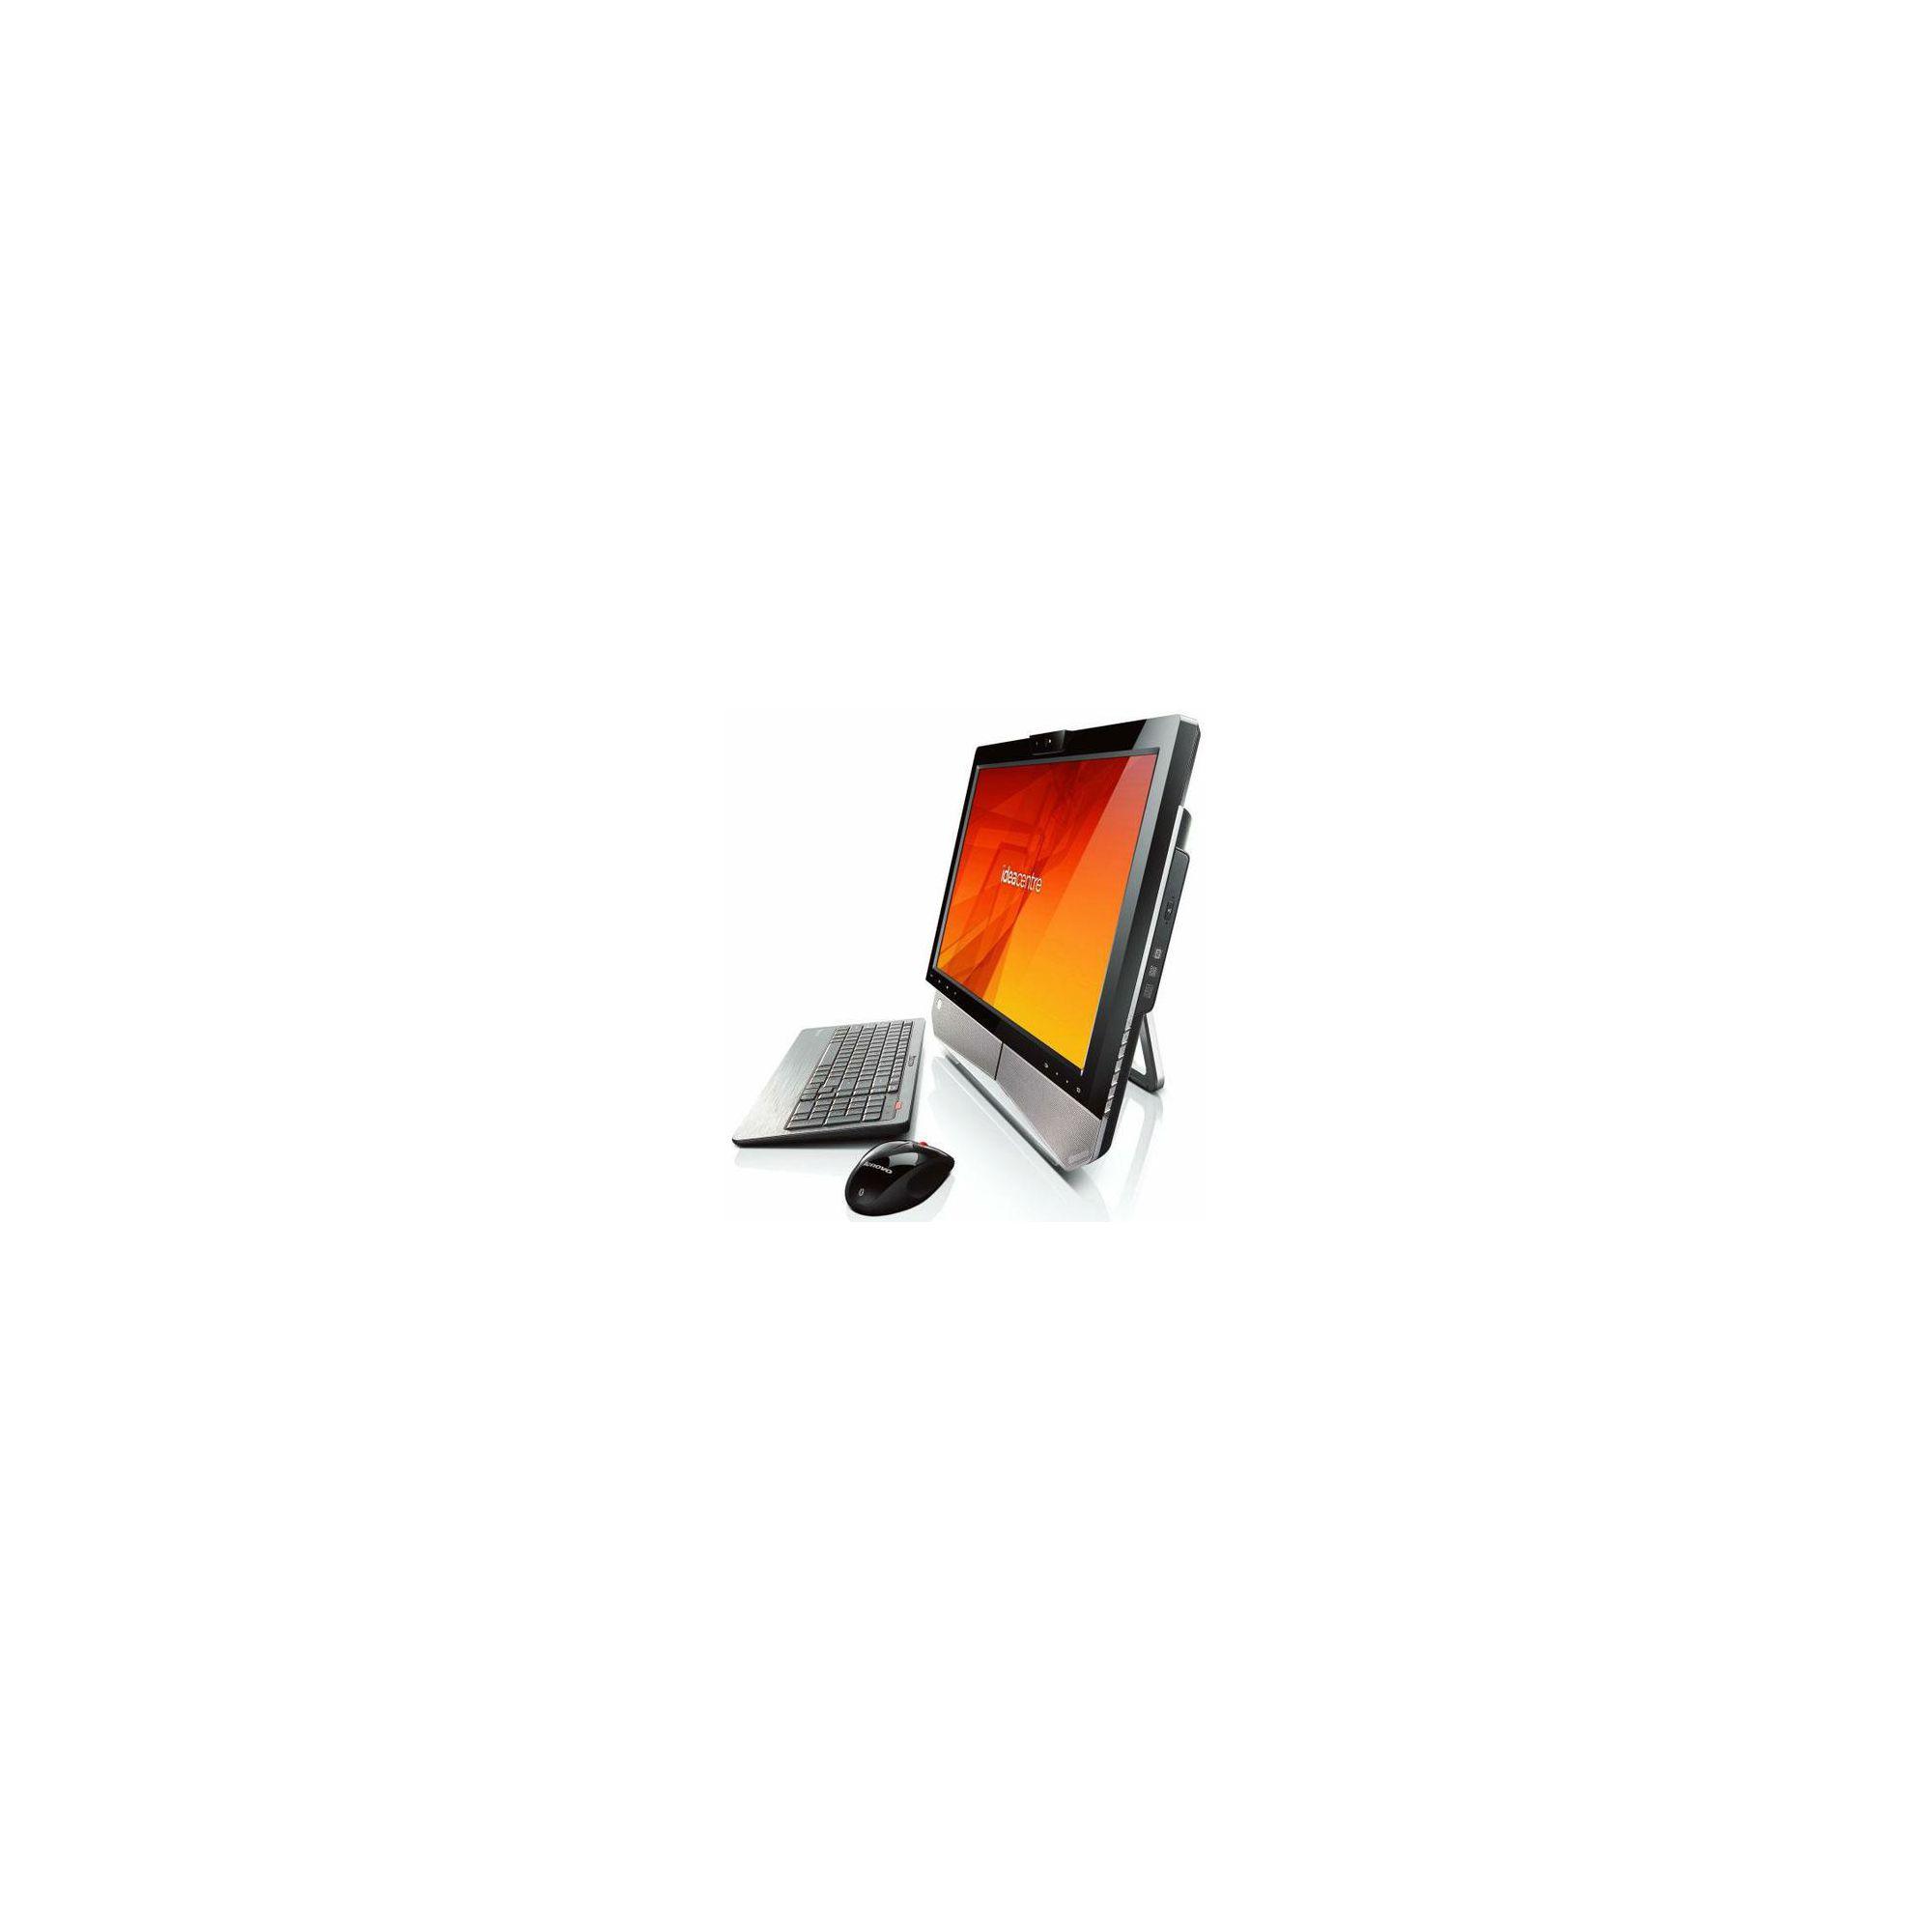 Lenovo VBX2JUK IdeaCentre B320 All-in-One Desktop PC at Tesco Direct